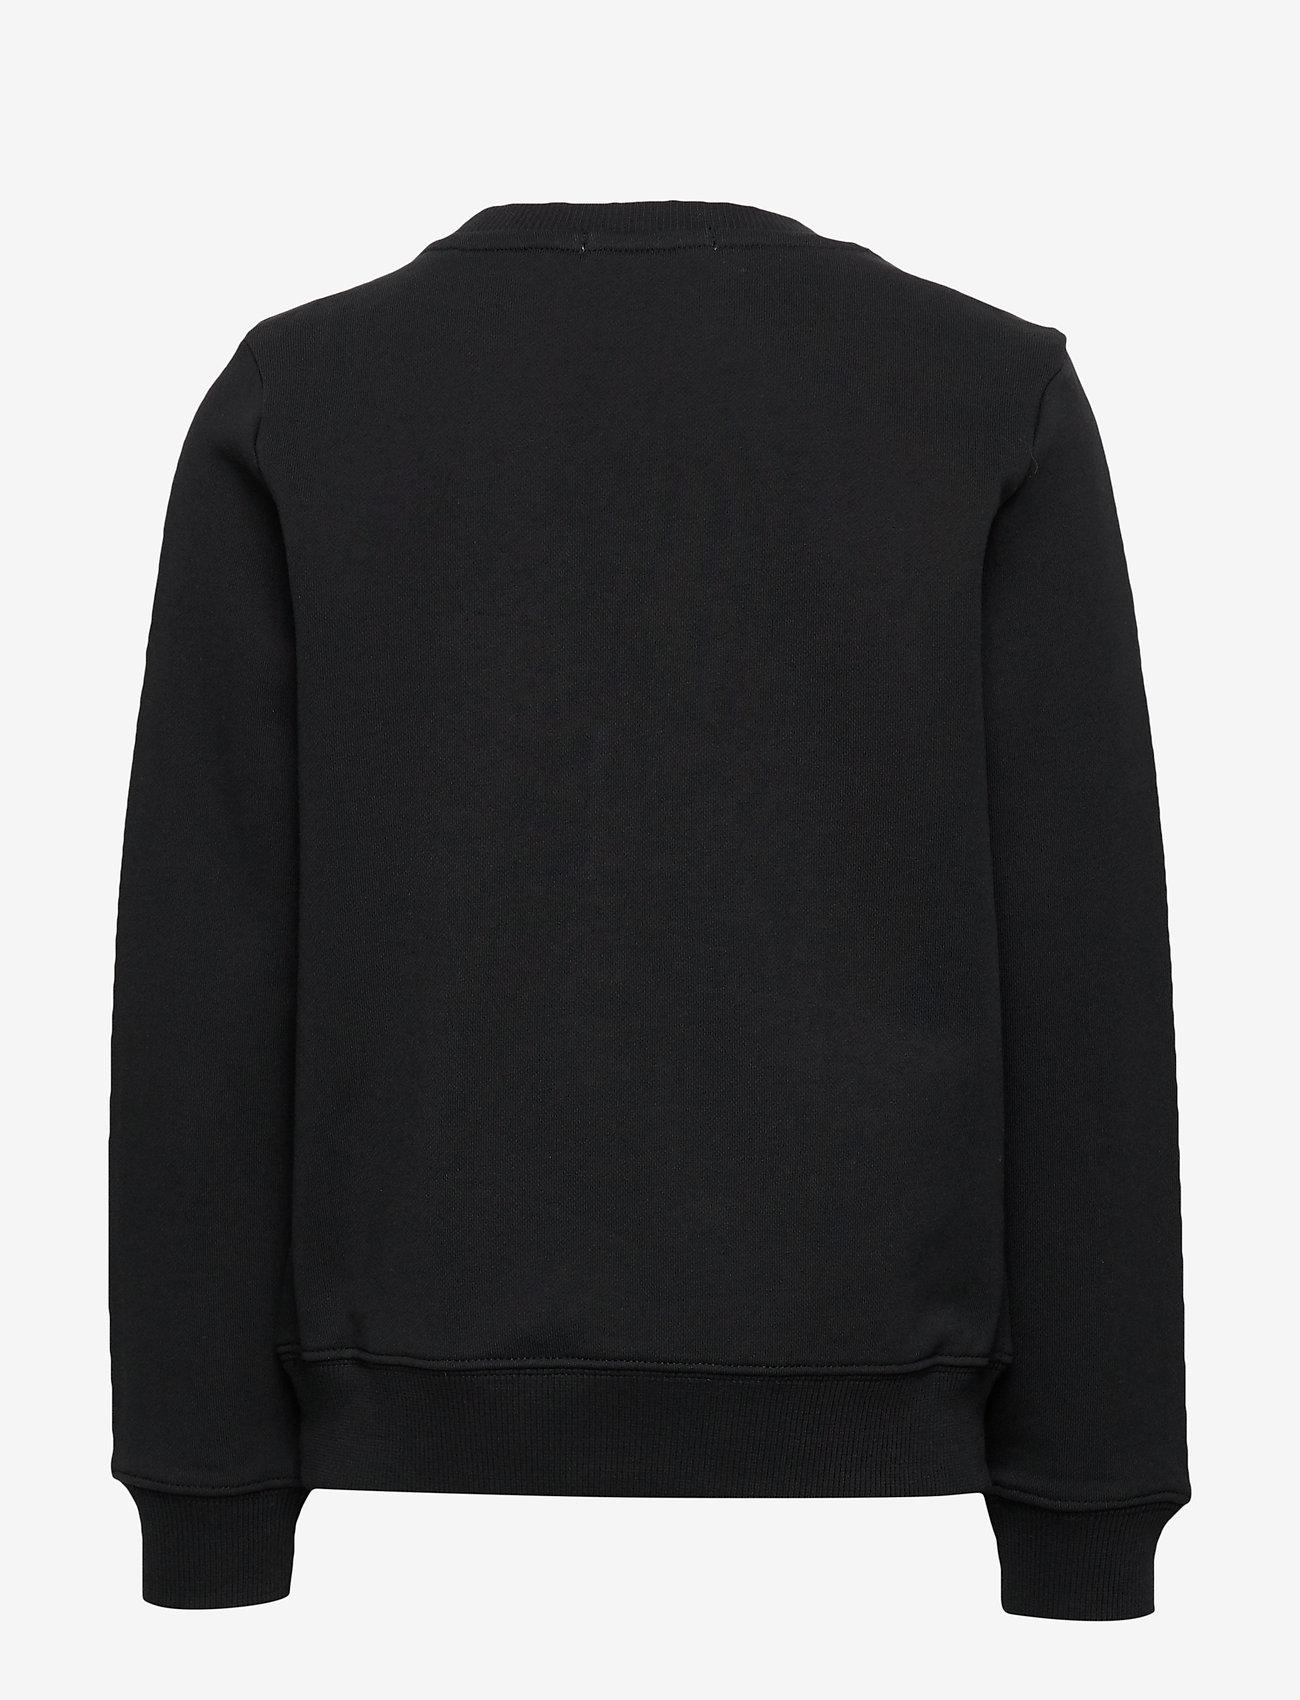 Calvin Klein - MONOGRAM LOGO SWEATSHIRT - sweatshirts - ck black - 1